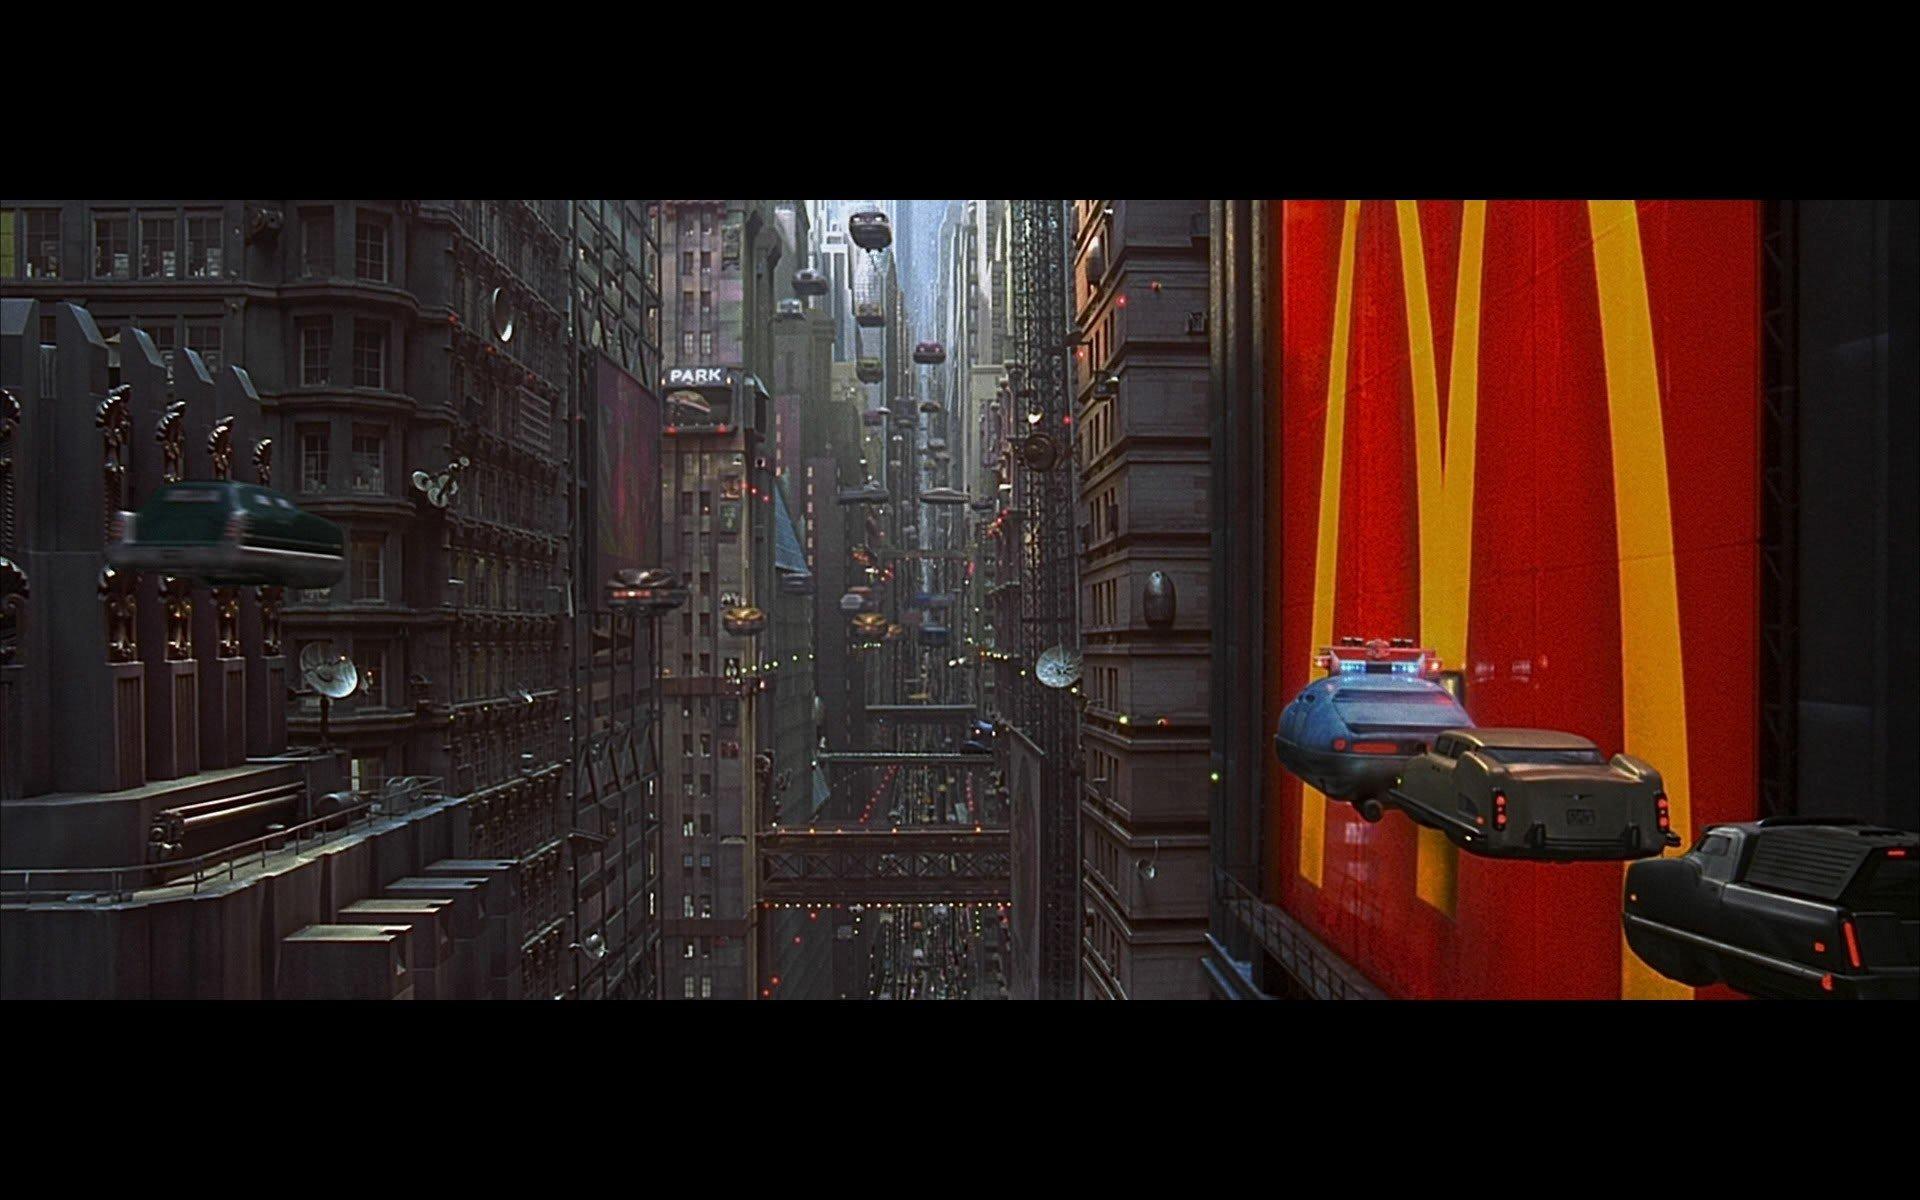 The Fifth Element Wallpaper 2   1920 X 1200 stmednet 1920x1200